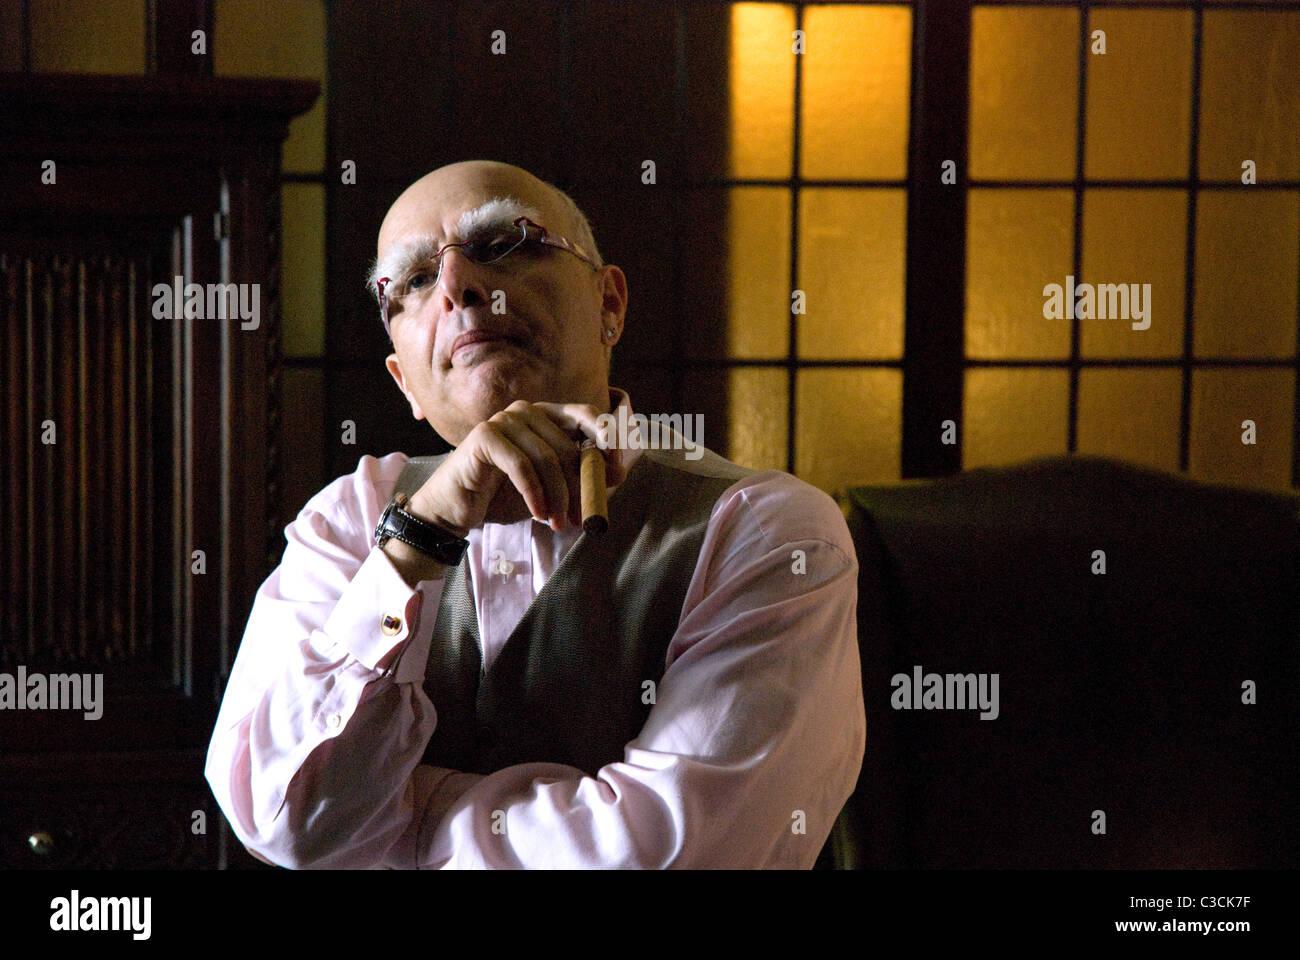 JOE PANTOLIANO THE JOB (2009) - Stock Image